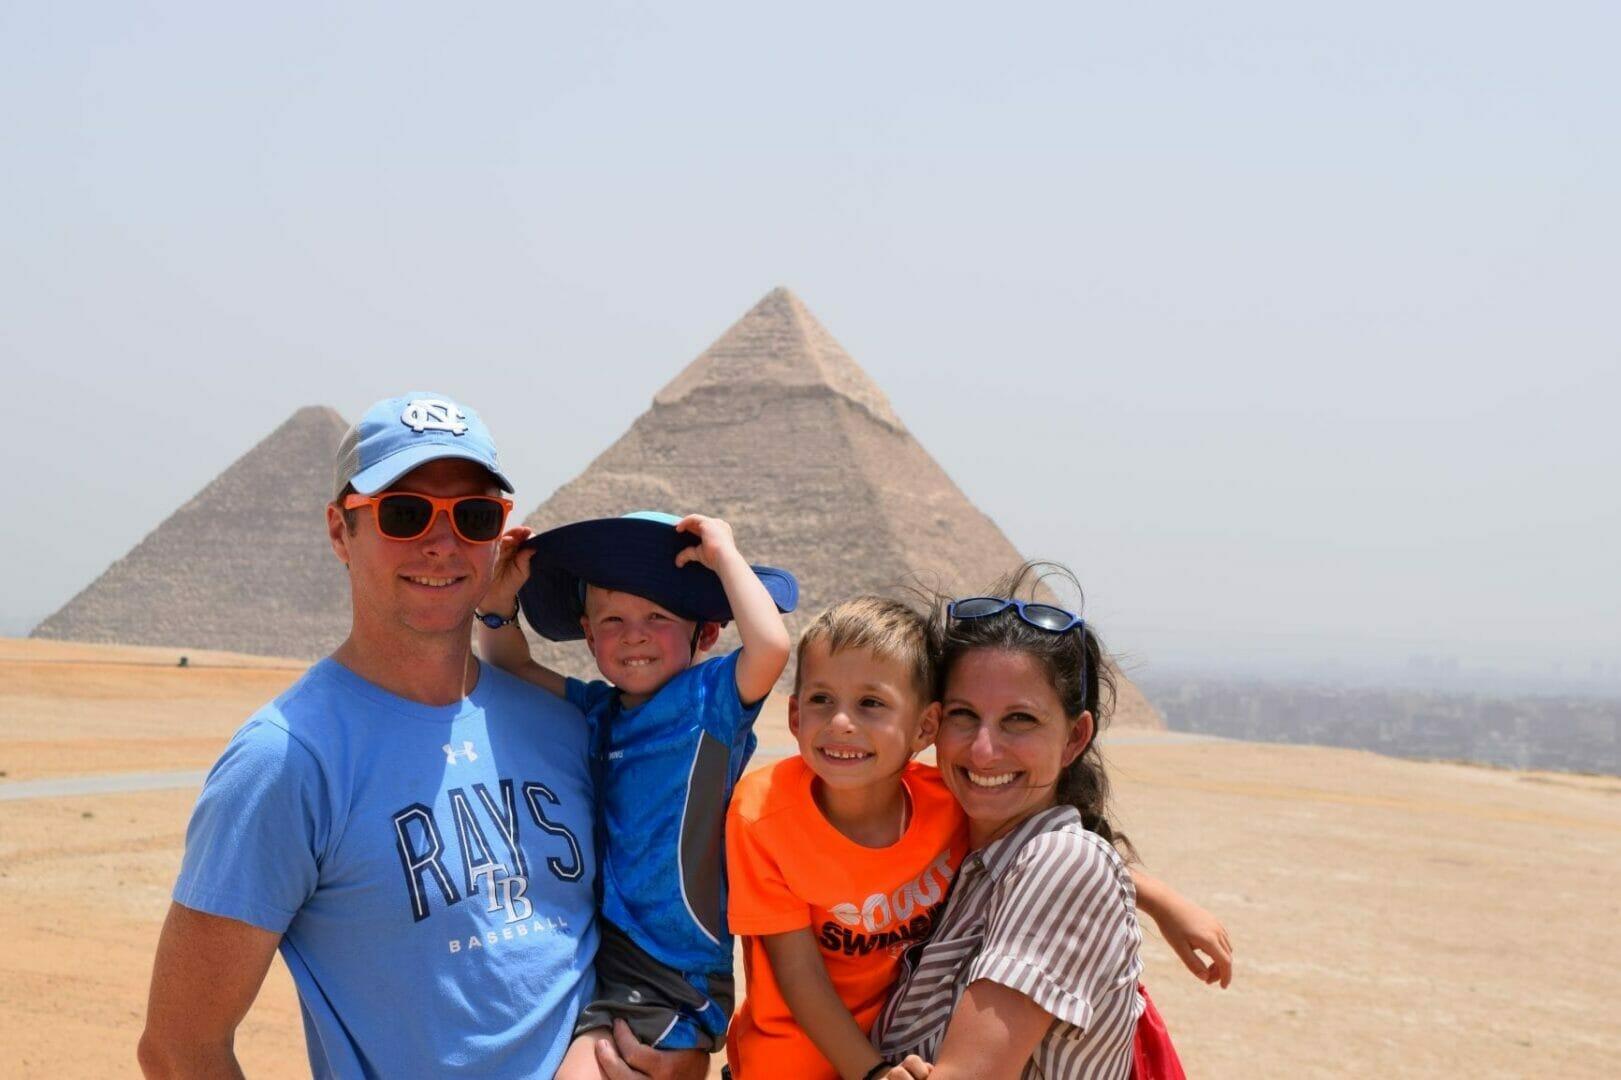 Family Tour at the Pyramids